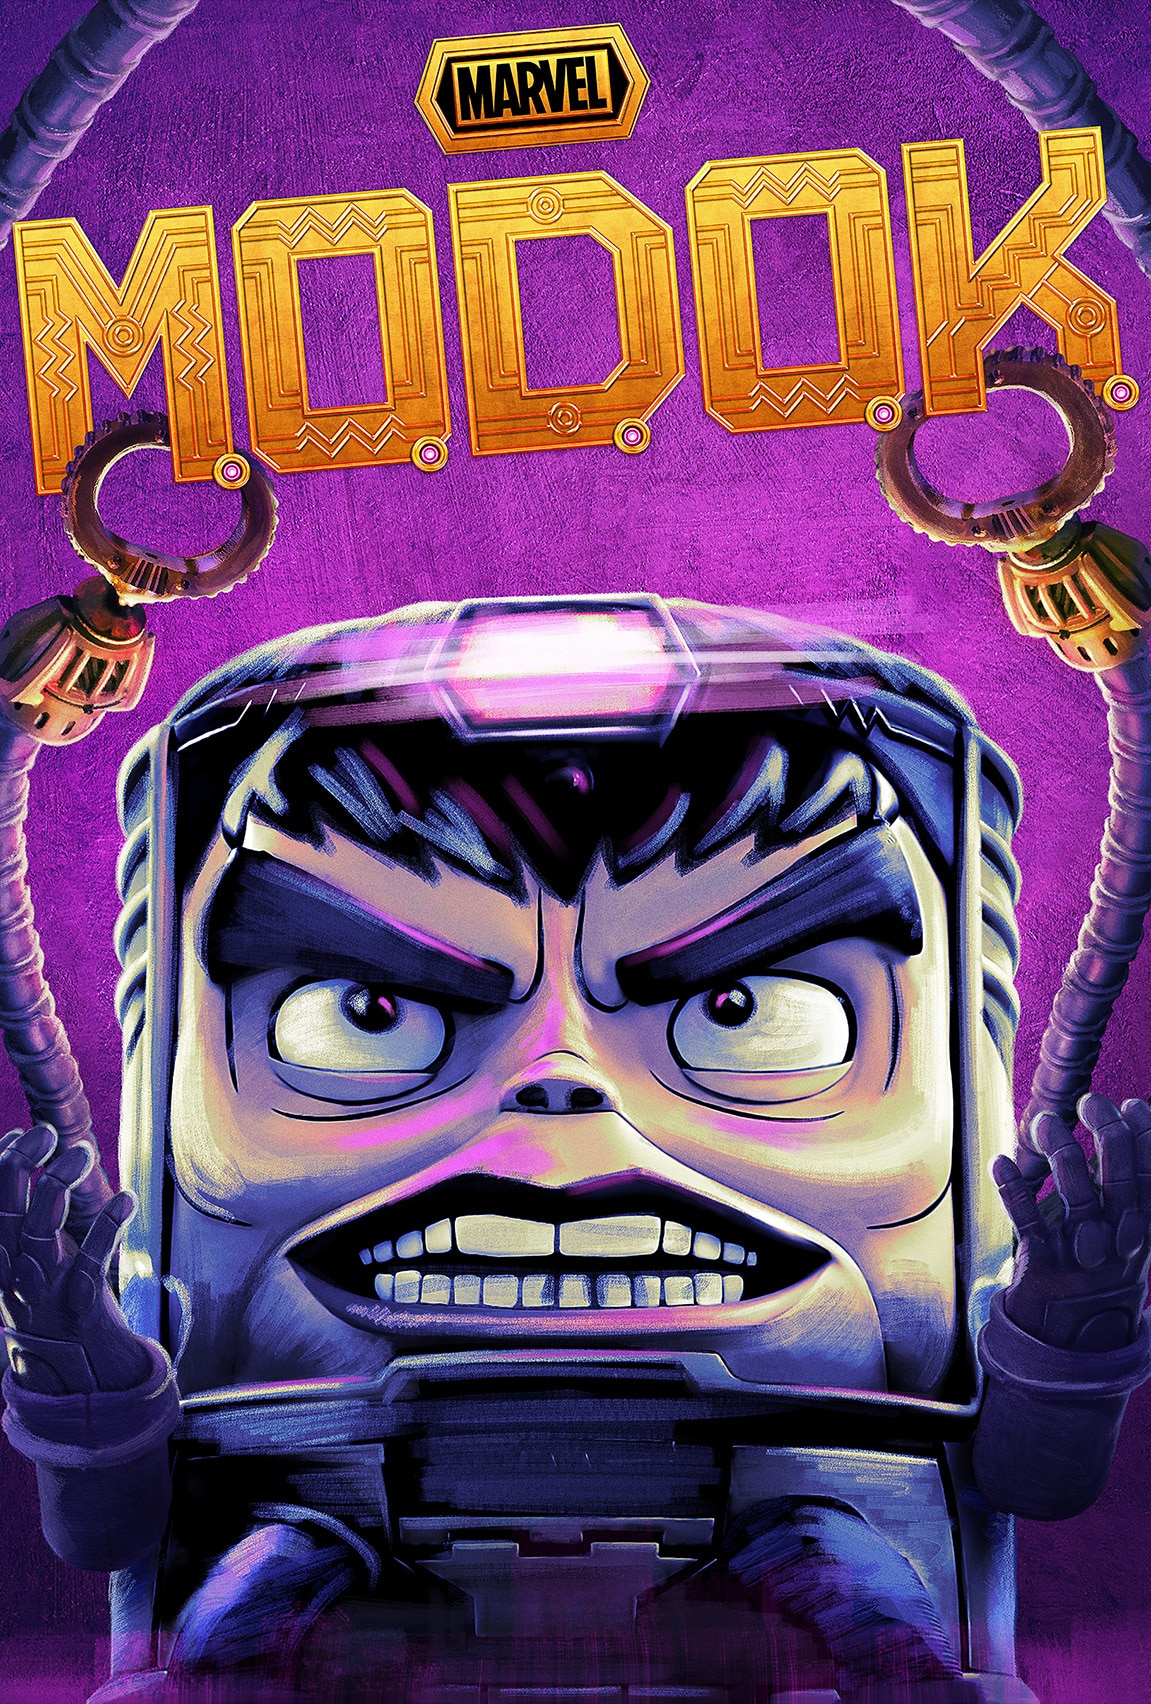 Marvel's M.O.D.O.K on Disney Plus